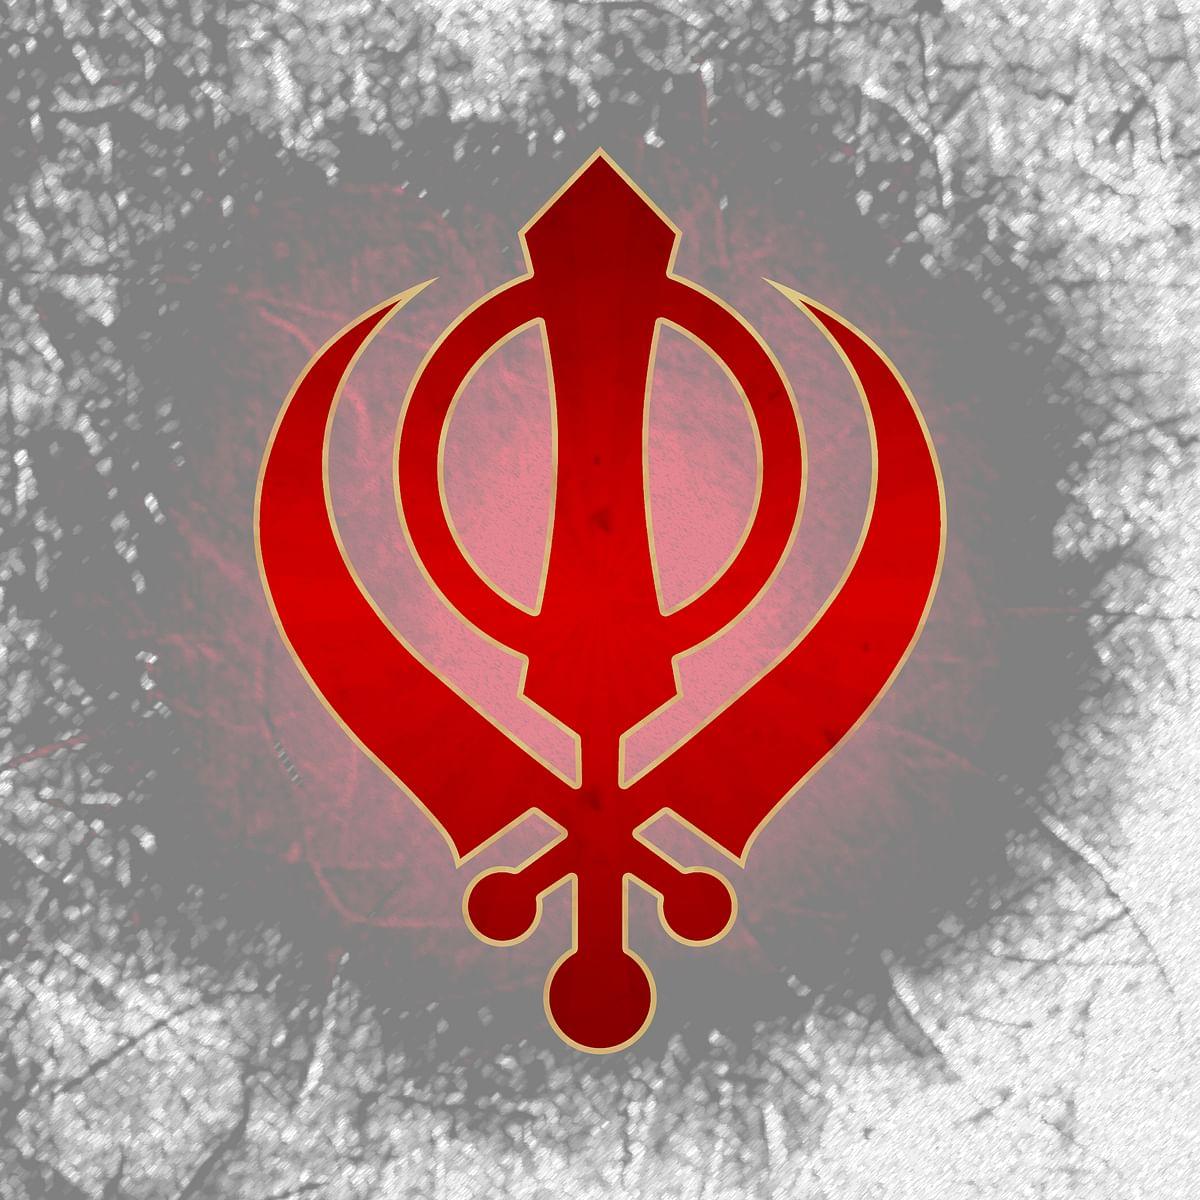 गुरु अर्जन देव जयंती - Guru Arjan Dev Birthday